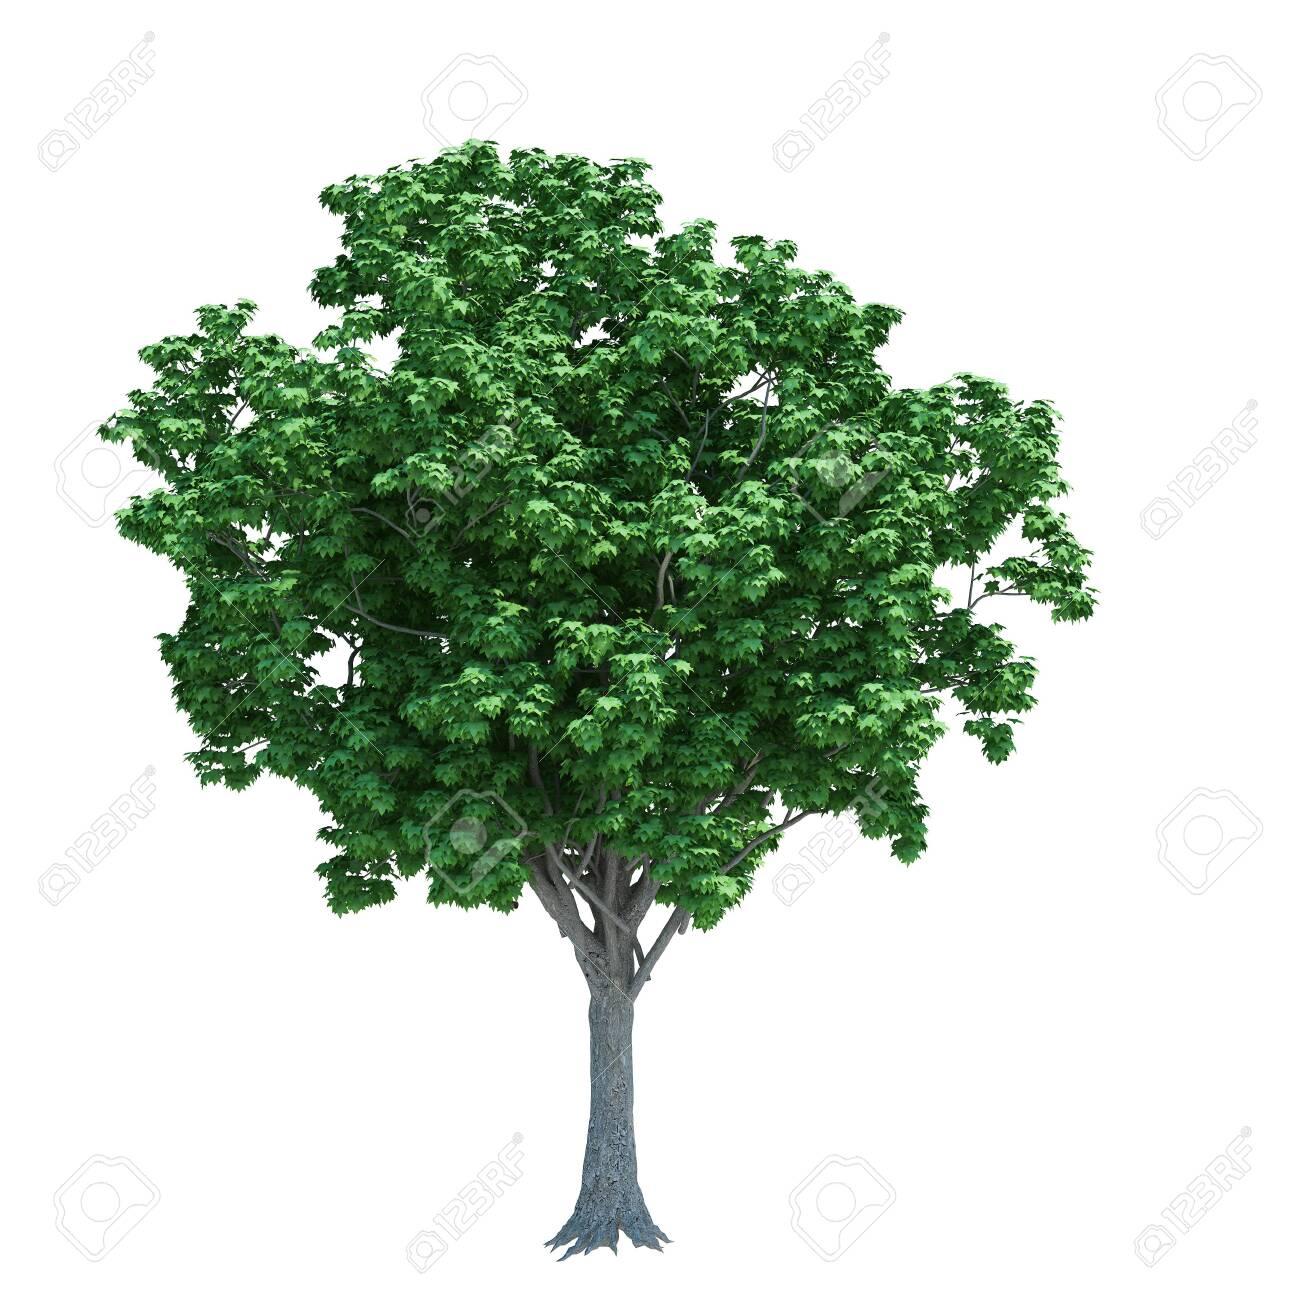 Nature object tree isolated white on background - 149886560